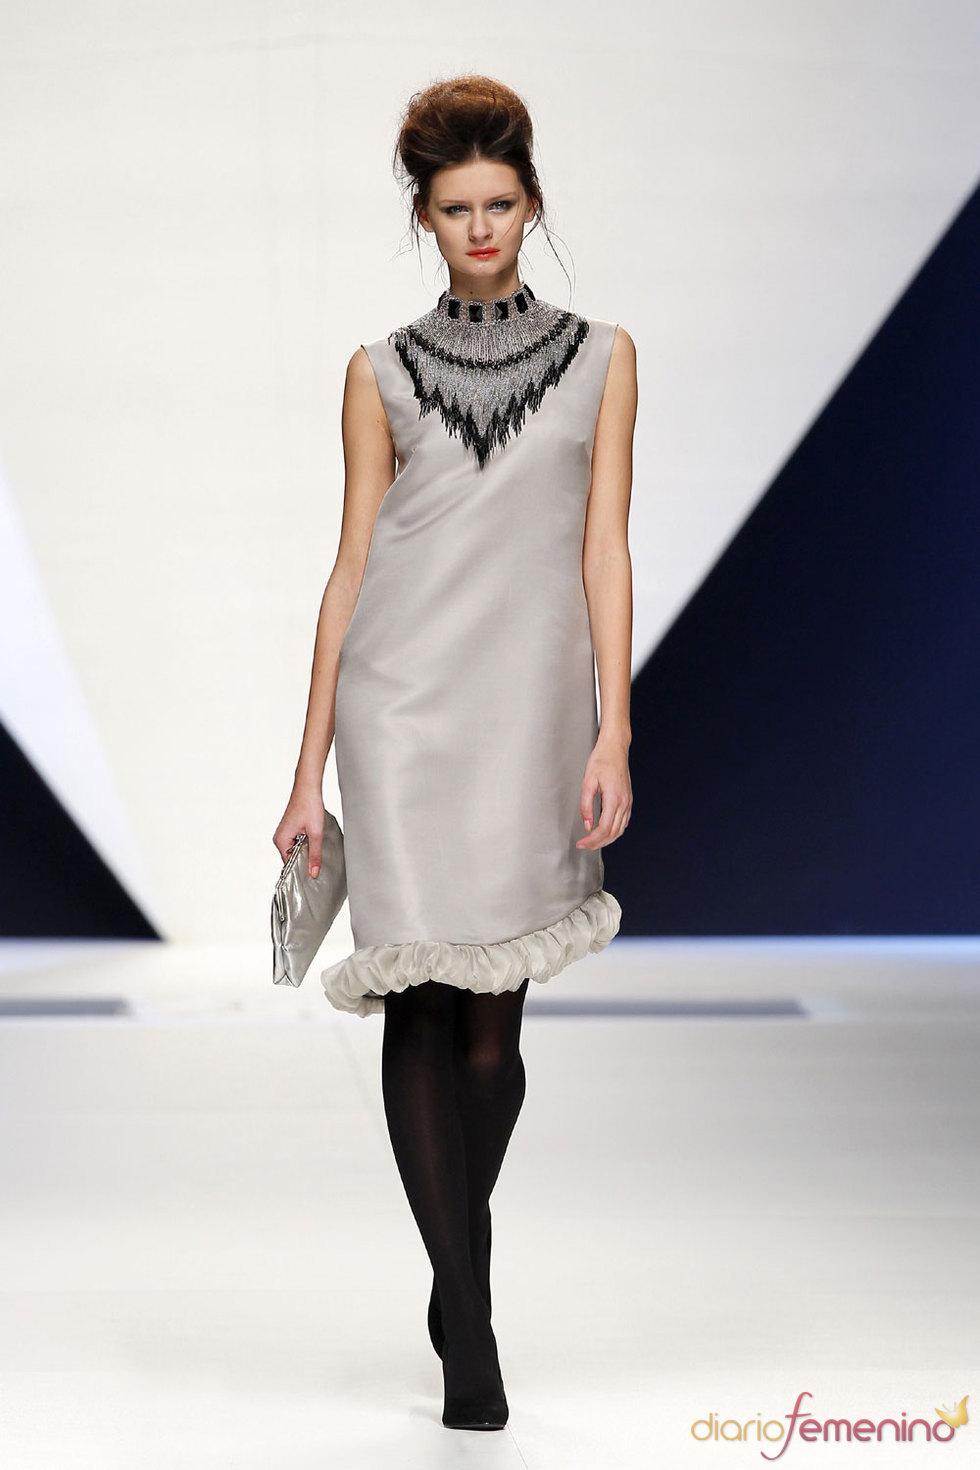 Fotos Moda BEBA'S CLOSET - Madrid Cibeles 2010